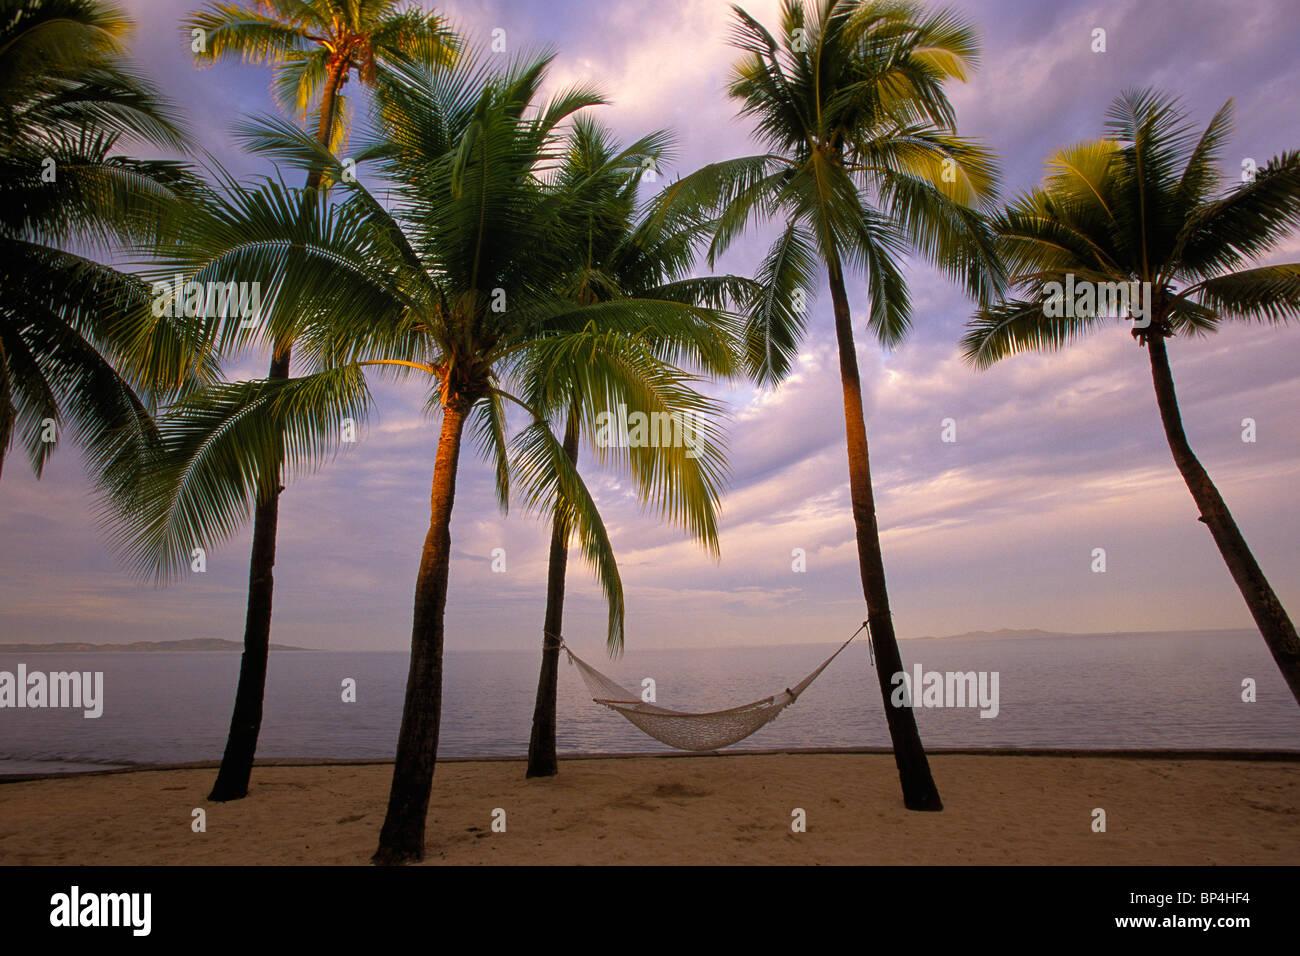 Palm trees with hammock on beach, Fiji, Pacific Ocean Stock Photo